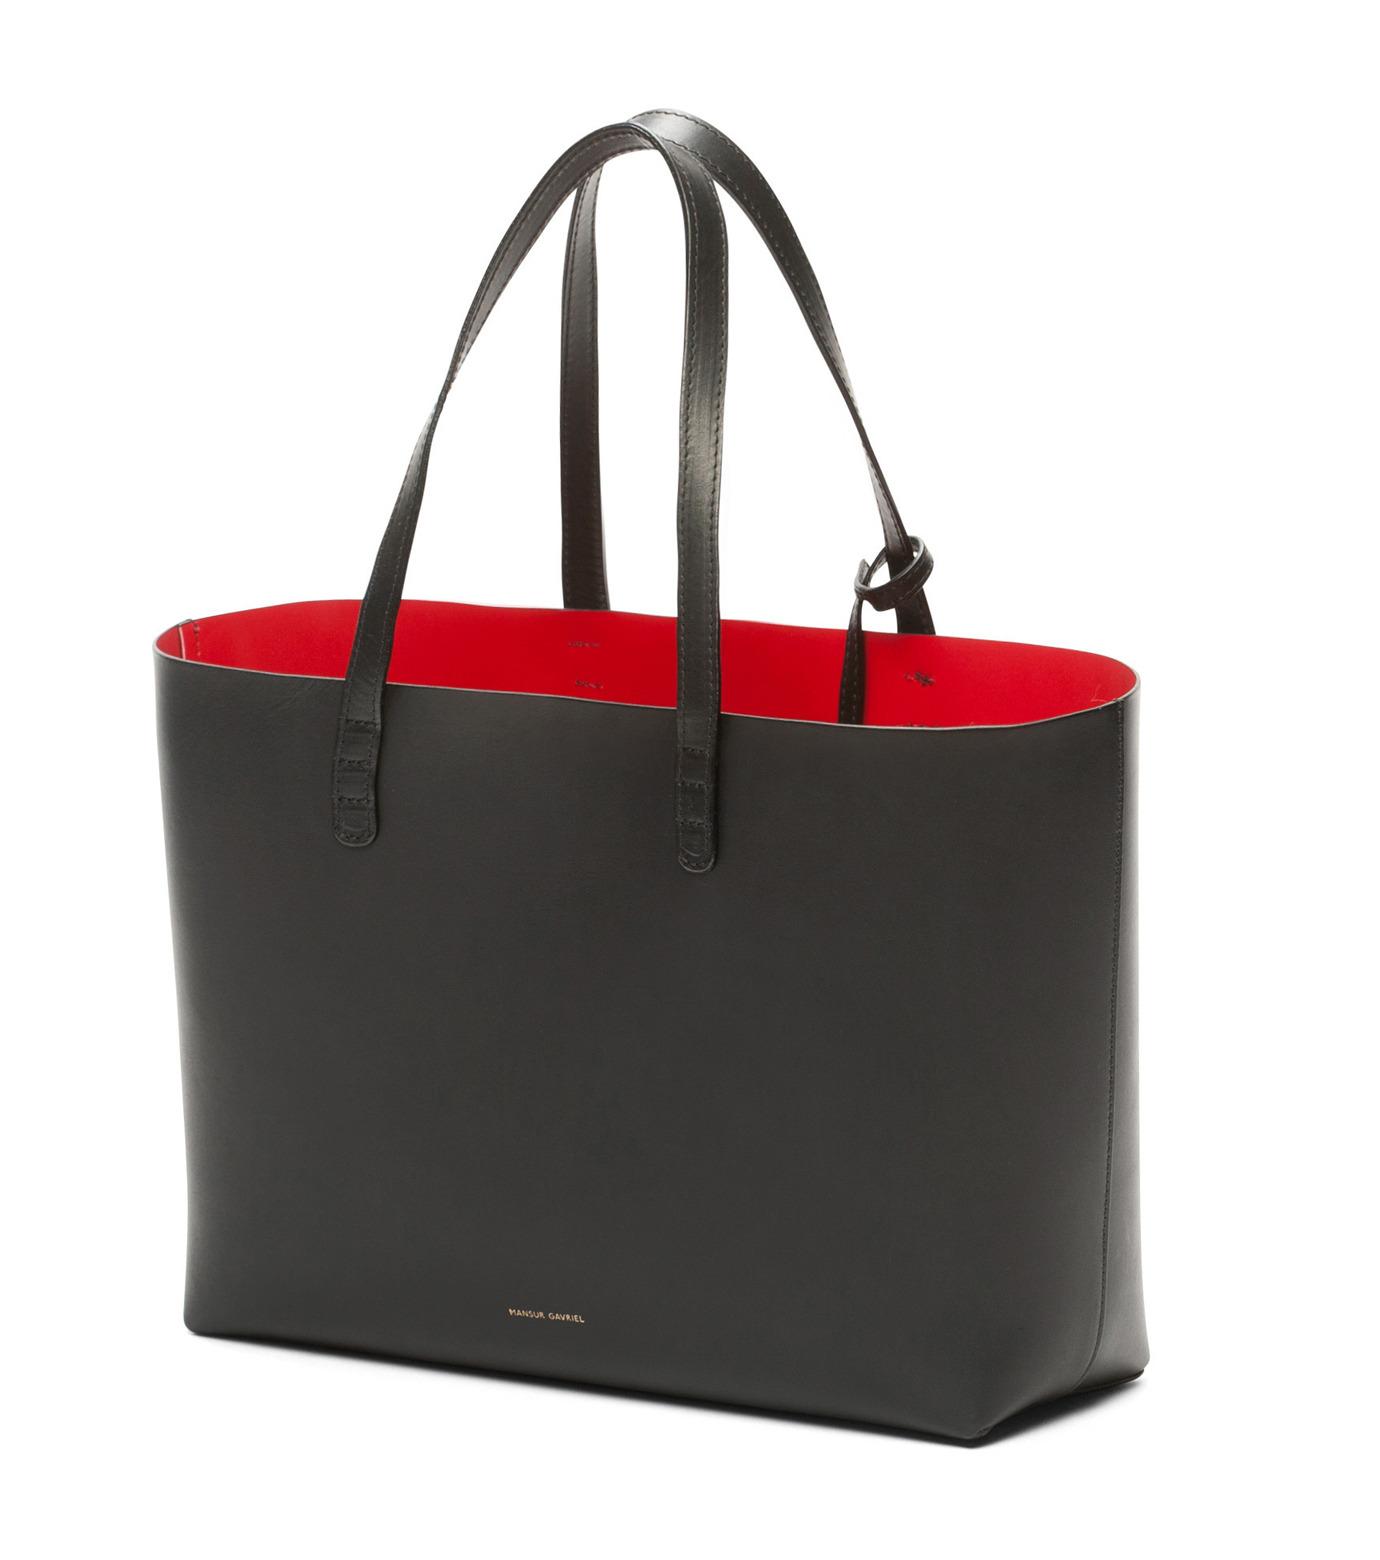 Mansur Gavriel(マンサーガブリエル)のSmall Tote-BLACK(バッグ/bag)-002A-13 拡大詳細画像2